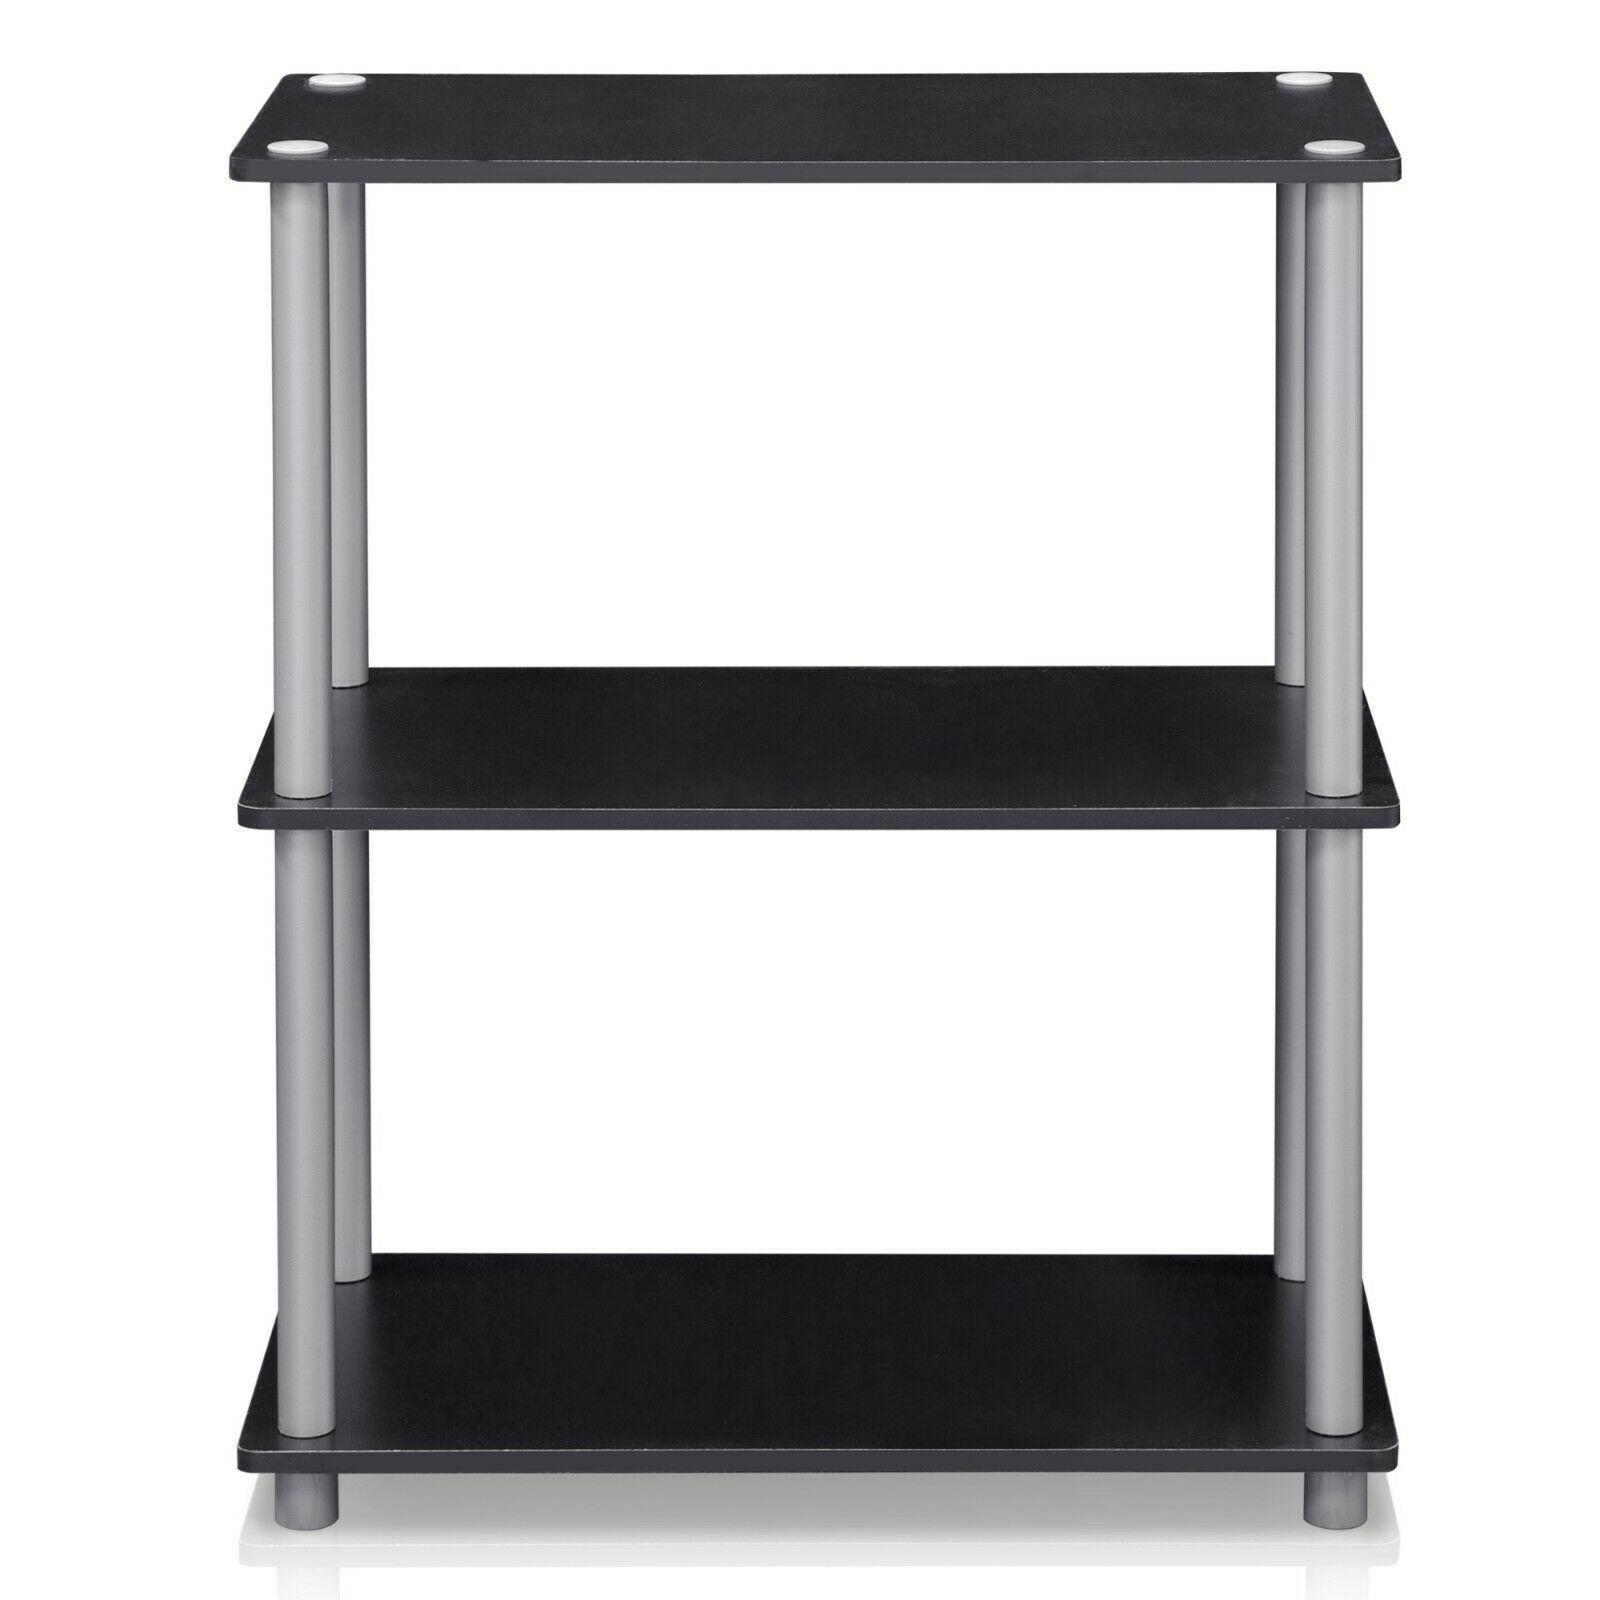 Furinno Turn-N-Tube 3-Tier Compact Multipurpose Shelf Display Rack - Black with Grey Tubes